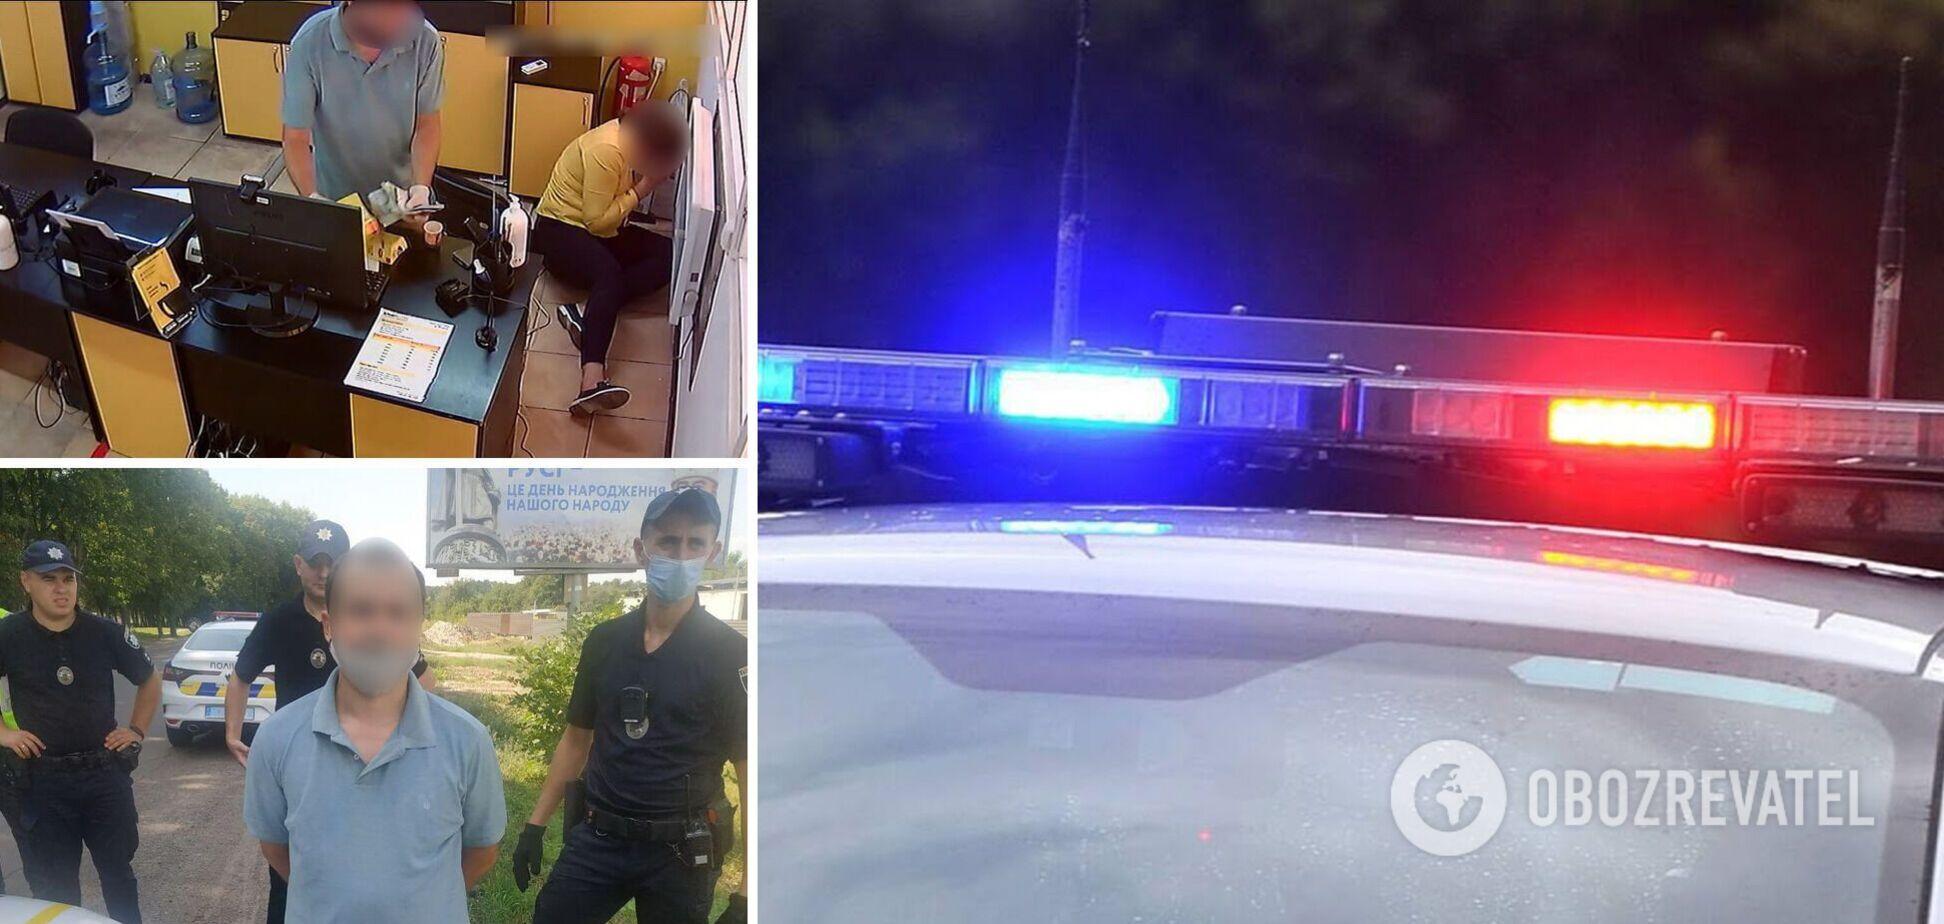 В Сумах мужчина с ножом ограбил кредитную организацию, его поймали в маршрутке. Фото